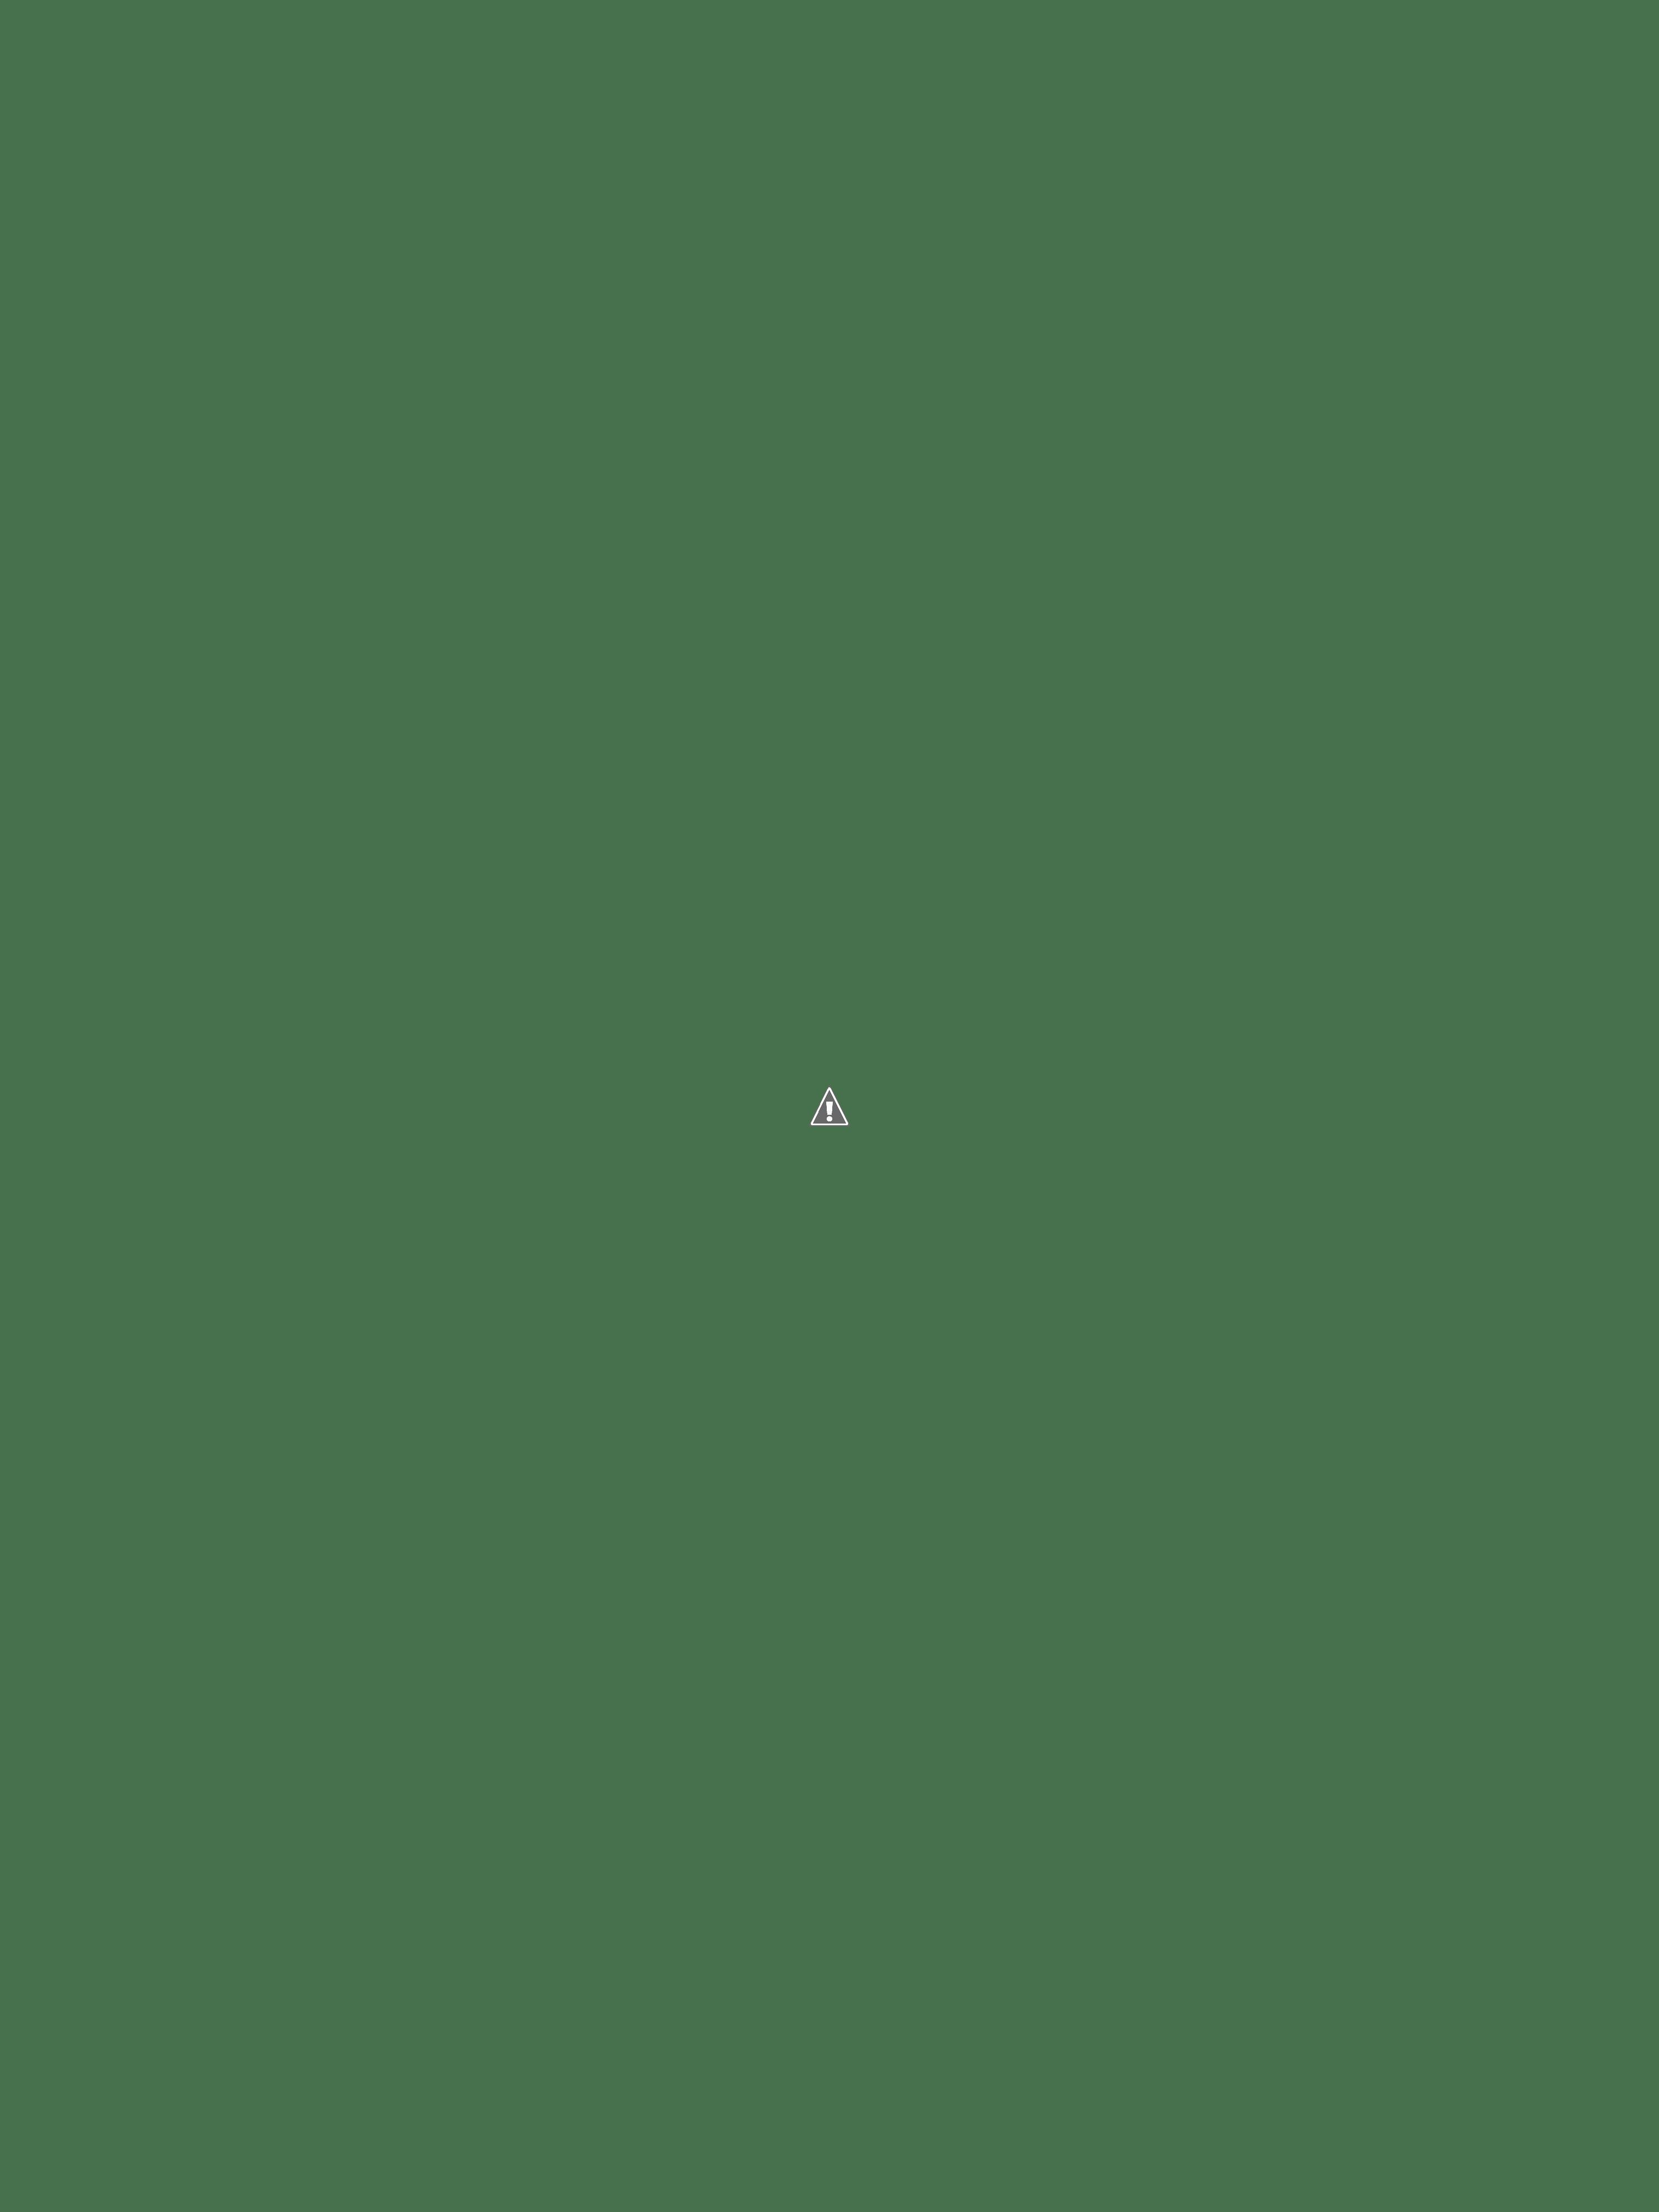 IMG 0261